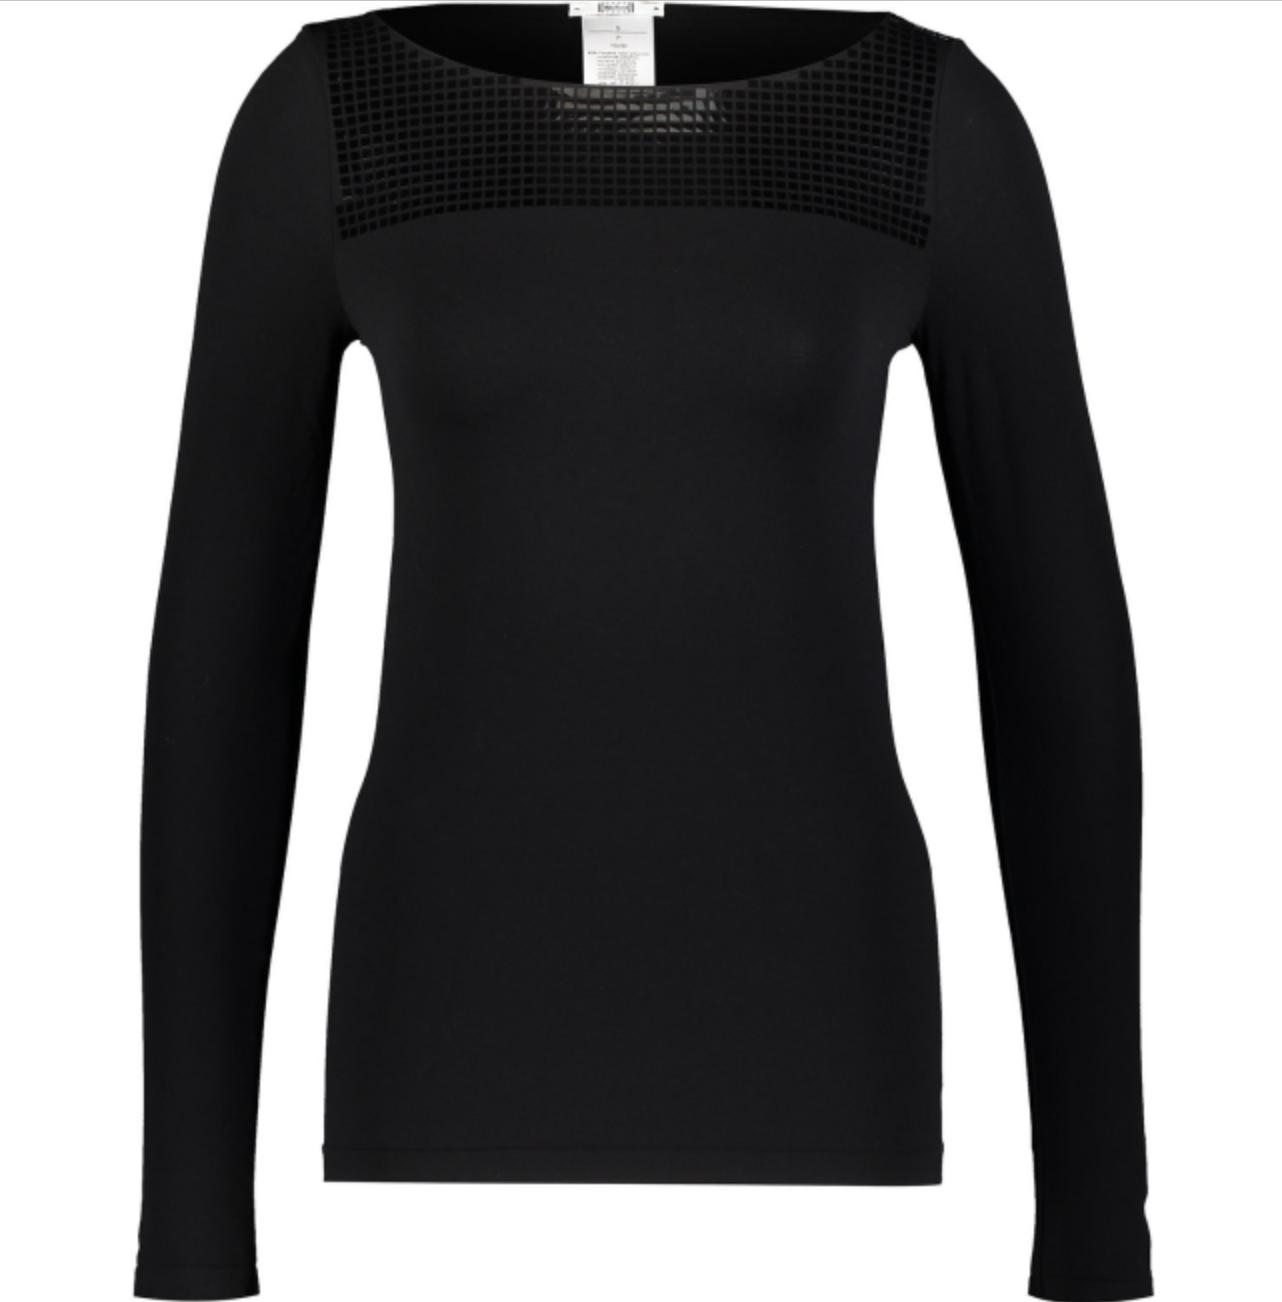 WOLFORD darleene Jersey-Negro S, M, L,  XL  edición limitada